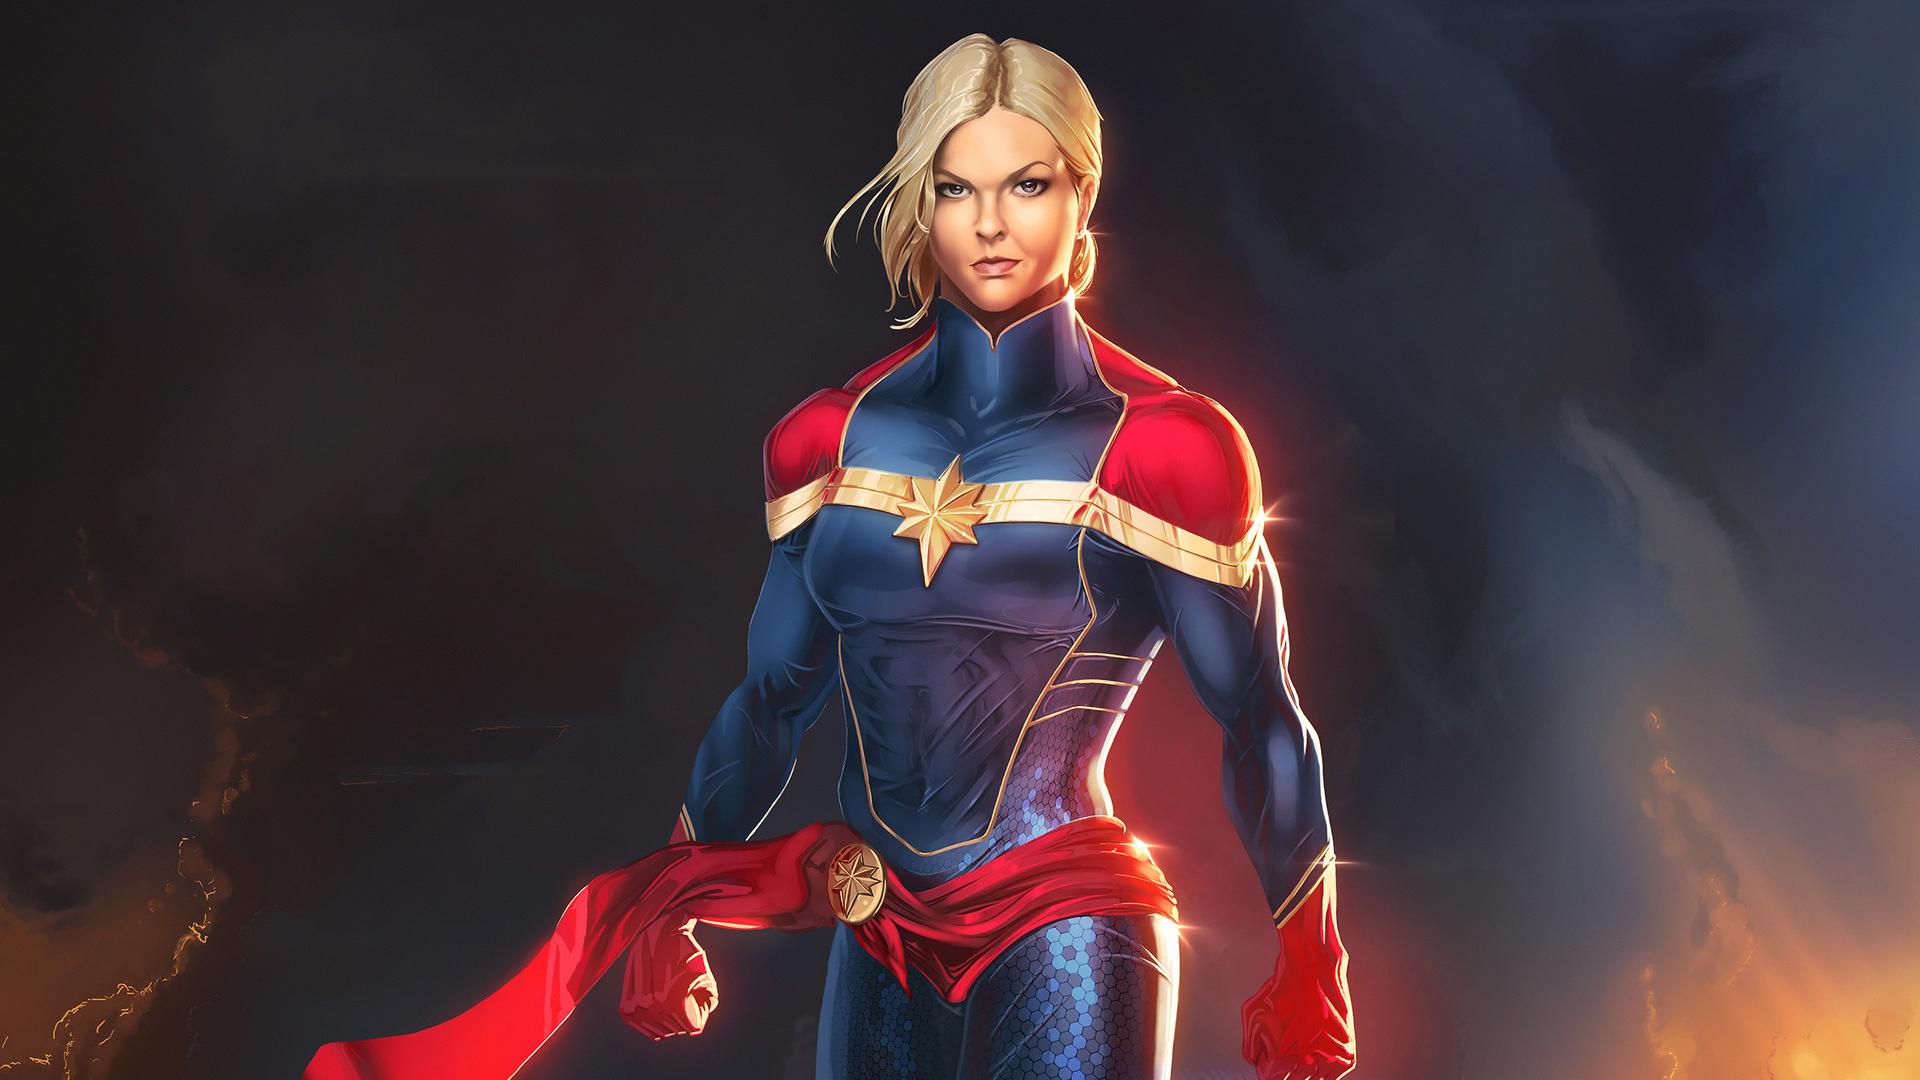 Captain Marvel Artworks, HD Superheroes, 4k Wallpapers ...